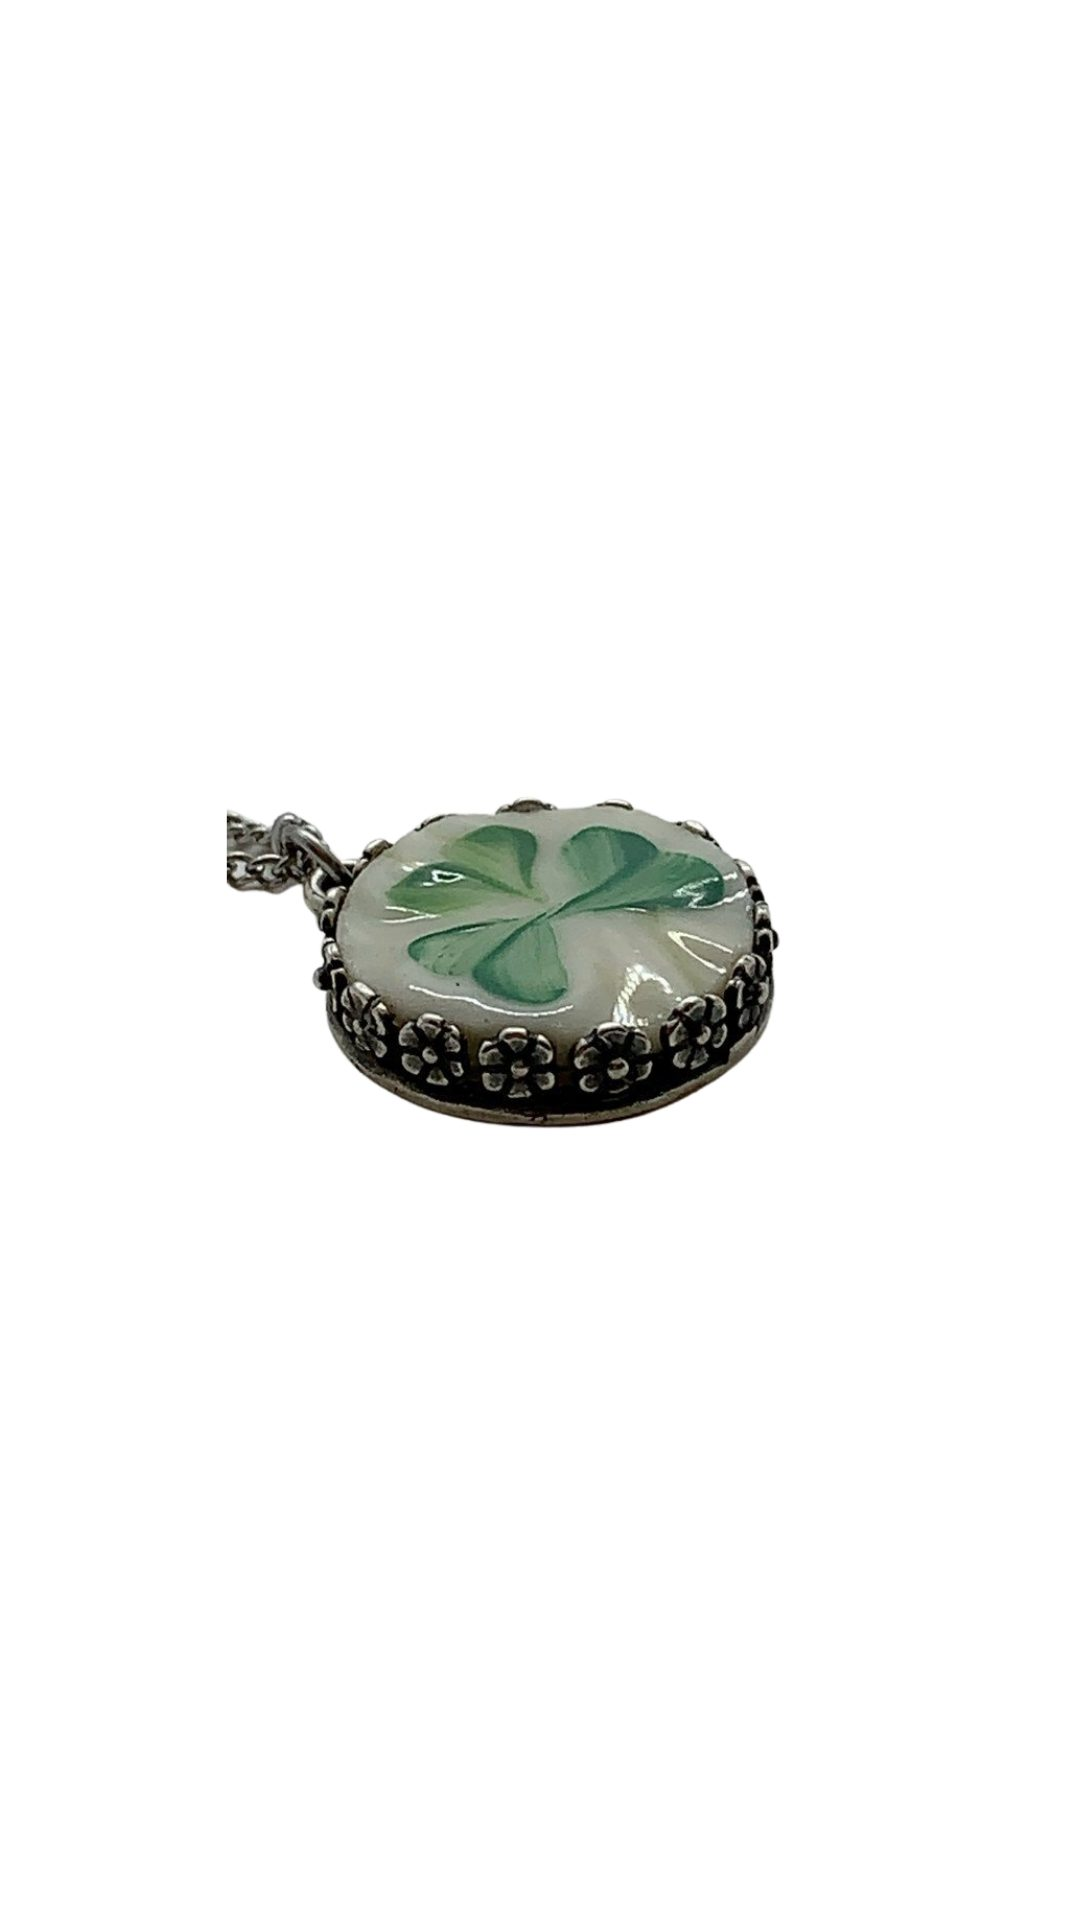 dainty-shamrock-broken-china-necklace4